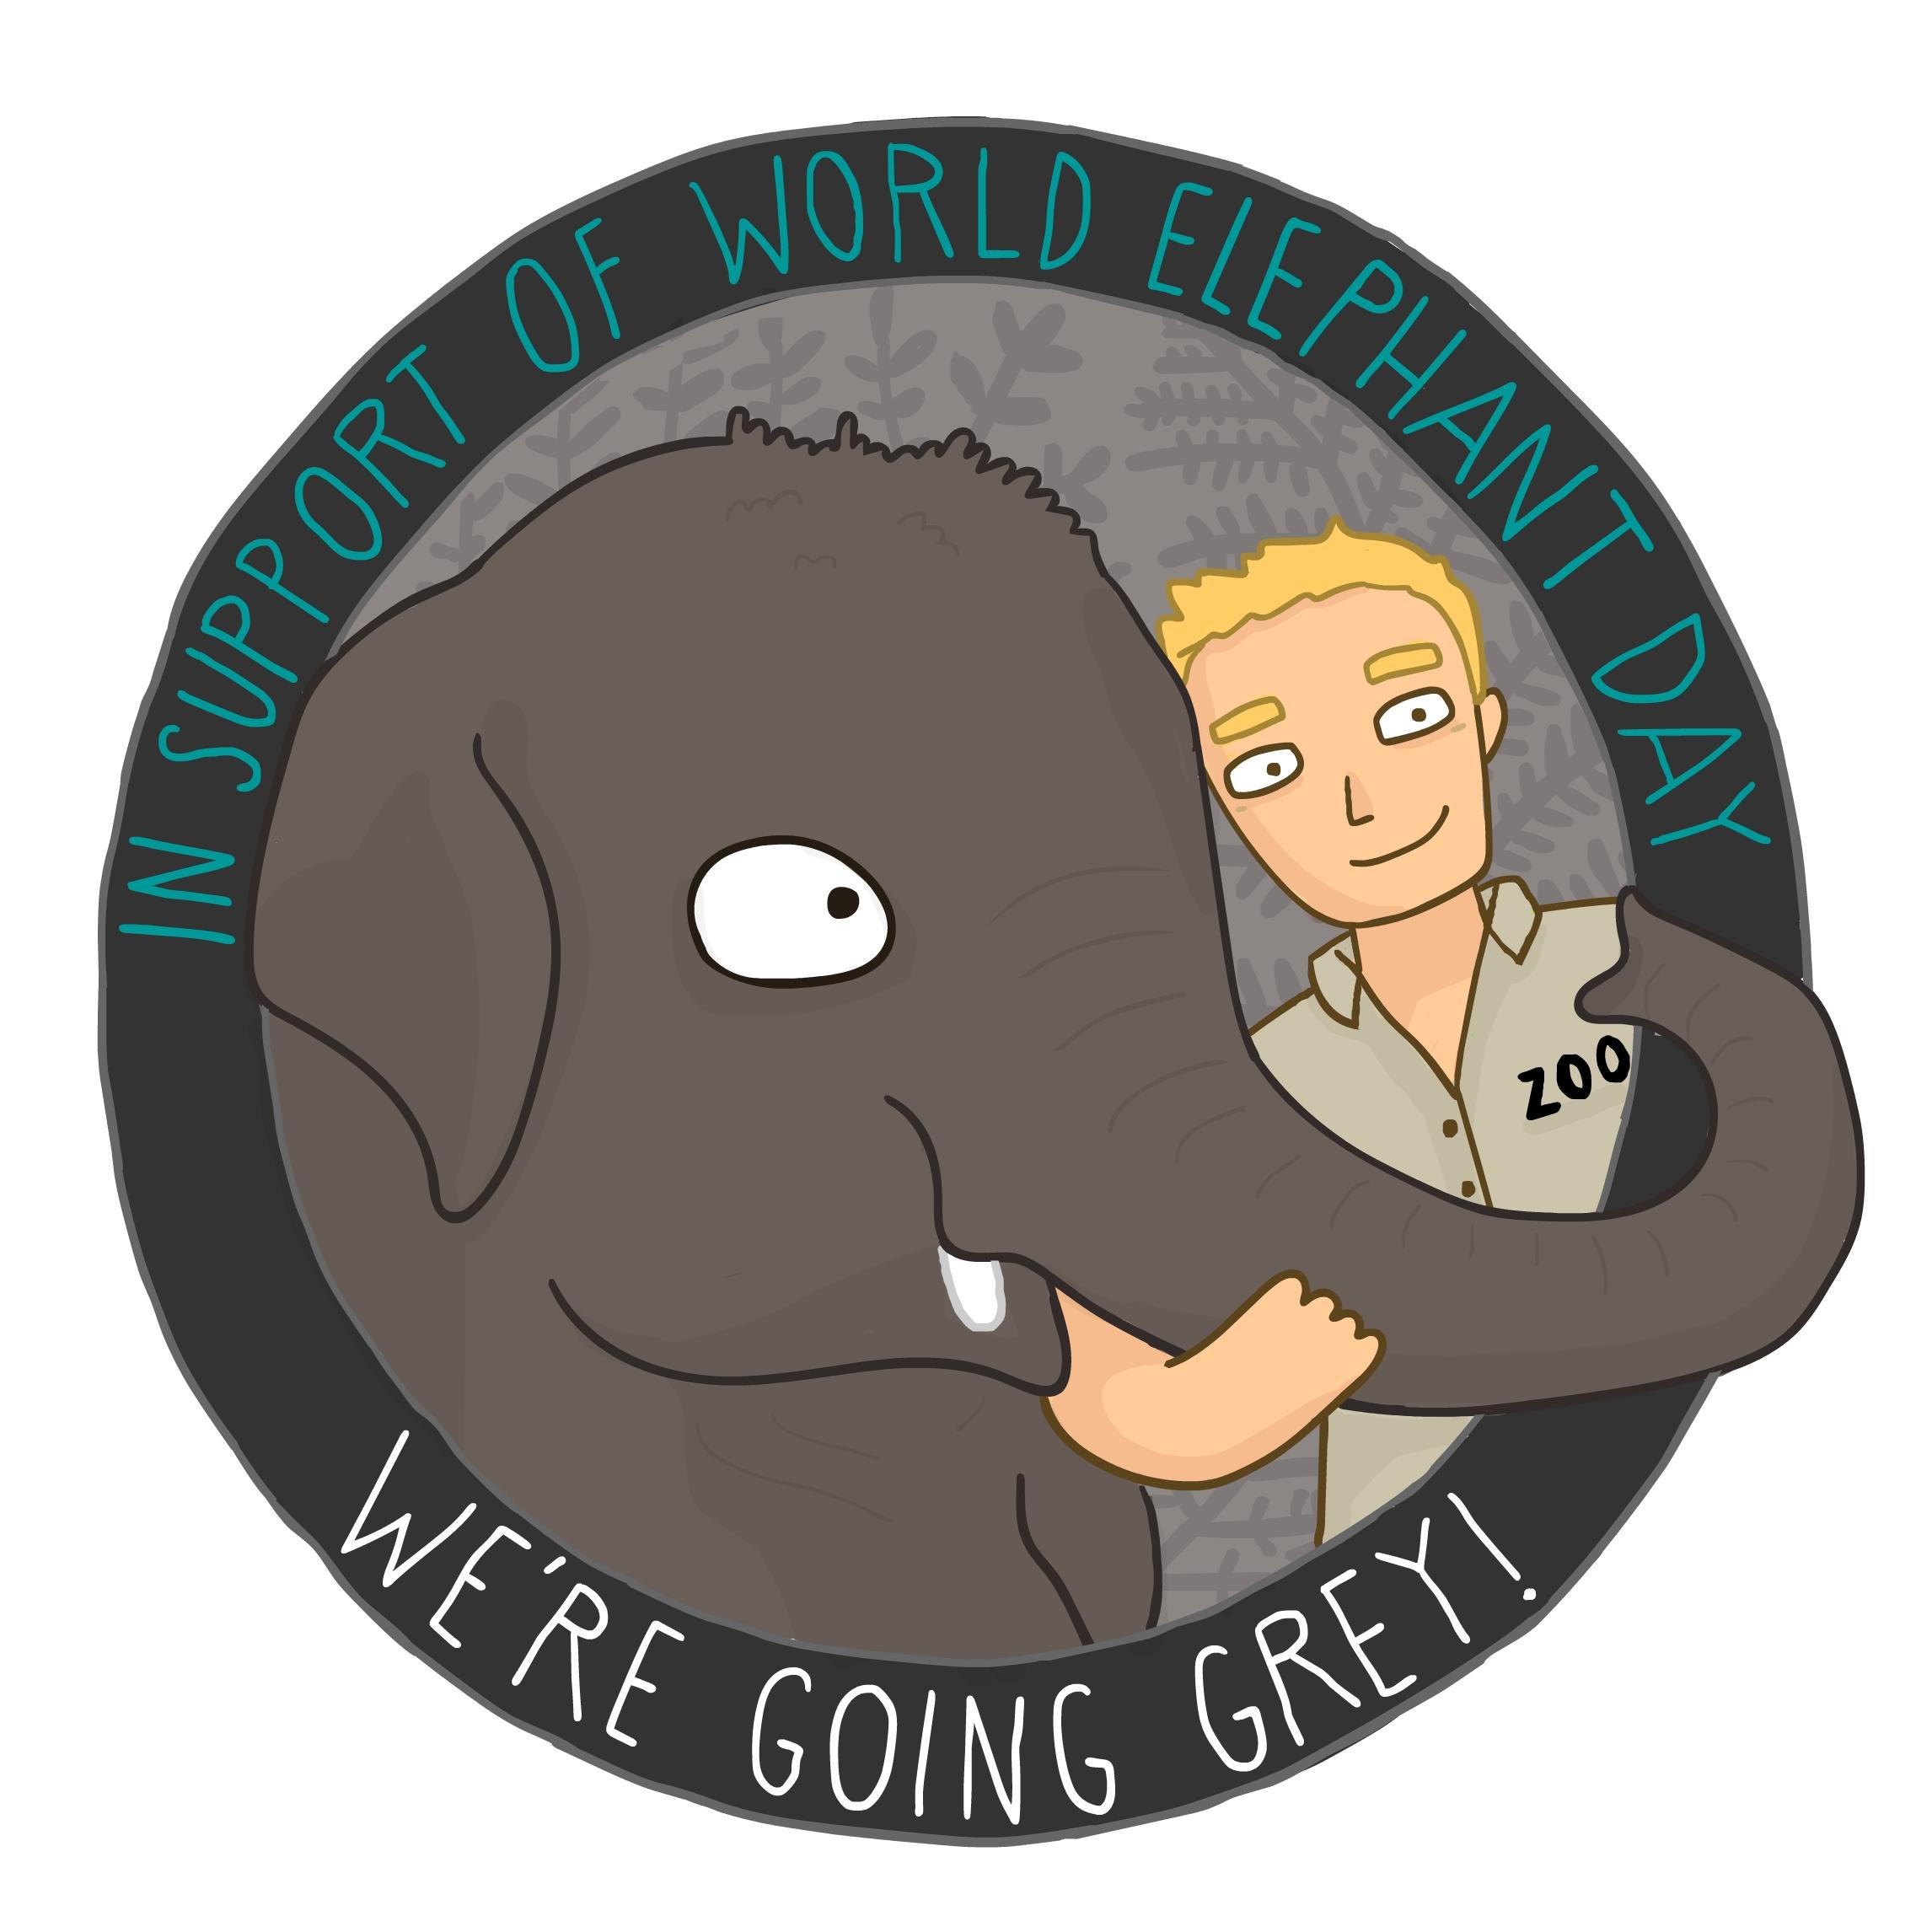 https://rfacdn.nz/zoo/assets/media/world-elephant-day-home-page.jpg